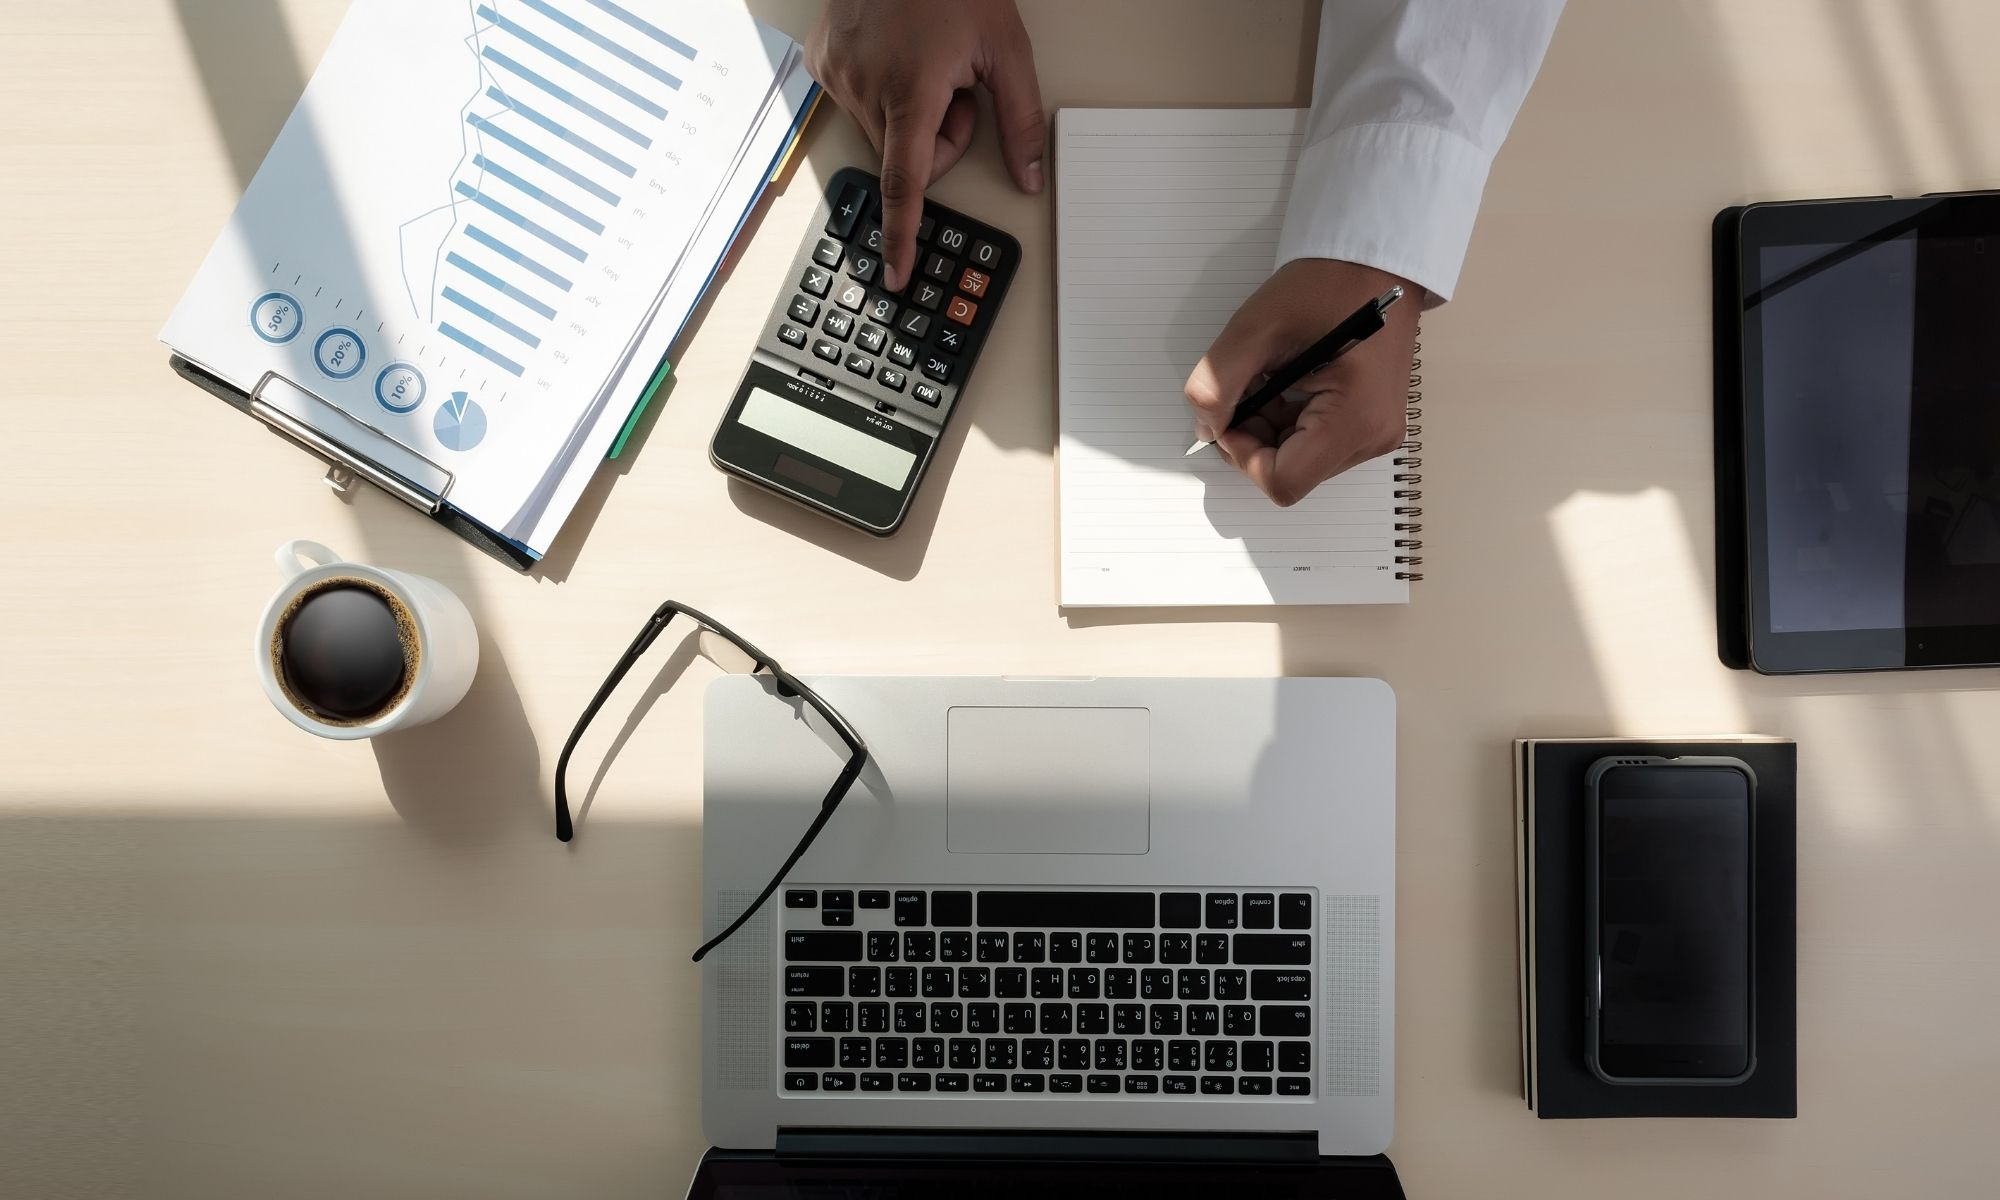 How To Determine Price-Per-Label Costs